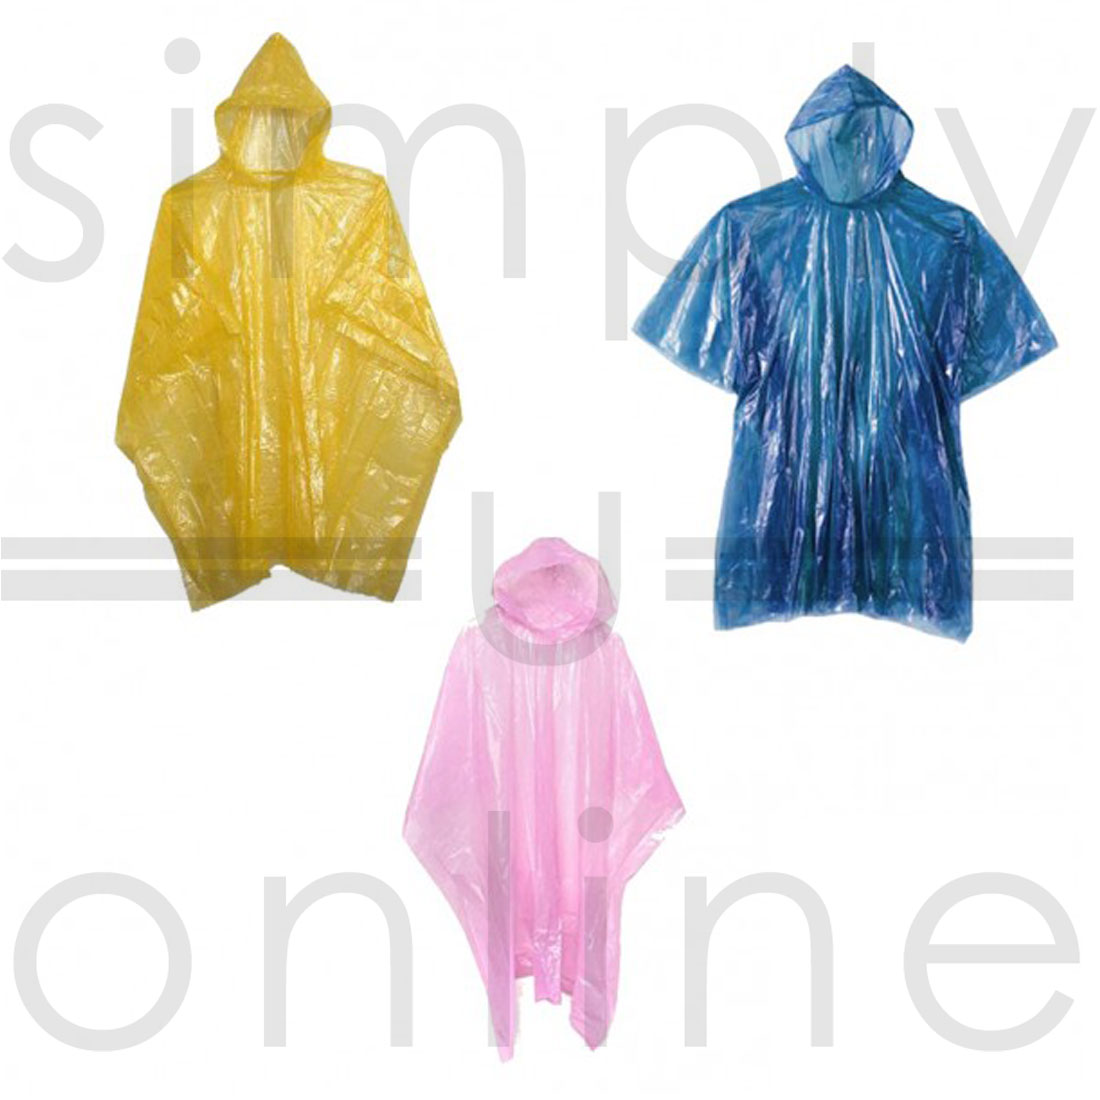 REUSABLE LIGHTWEIGHT WATERPROOF RAIN PONCHO FESTIVALS /& THEME PARKS CHILD YELLOW